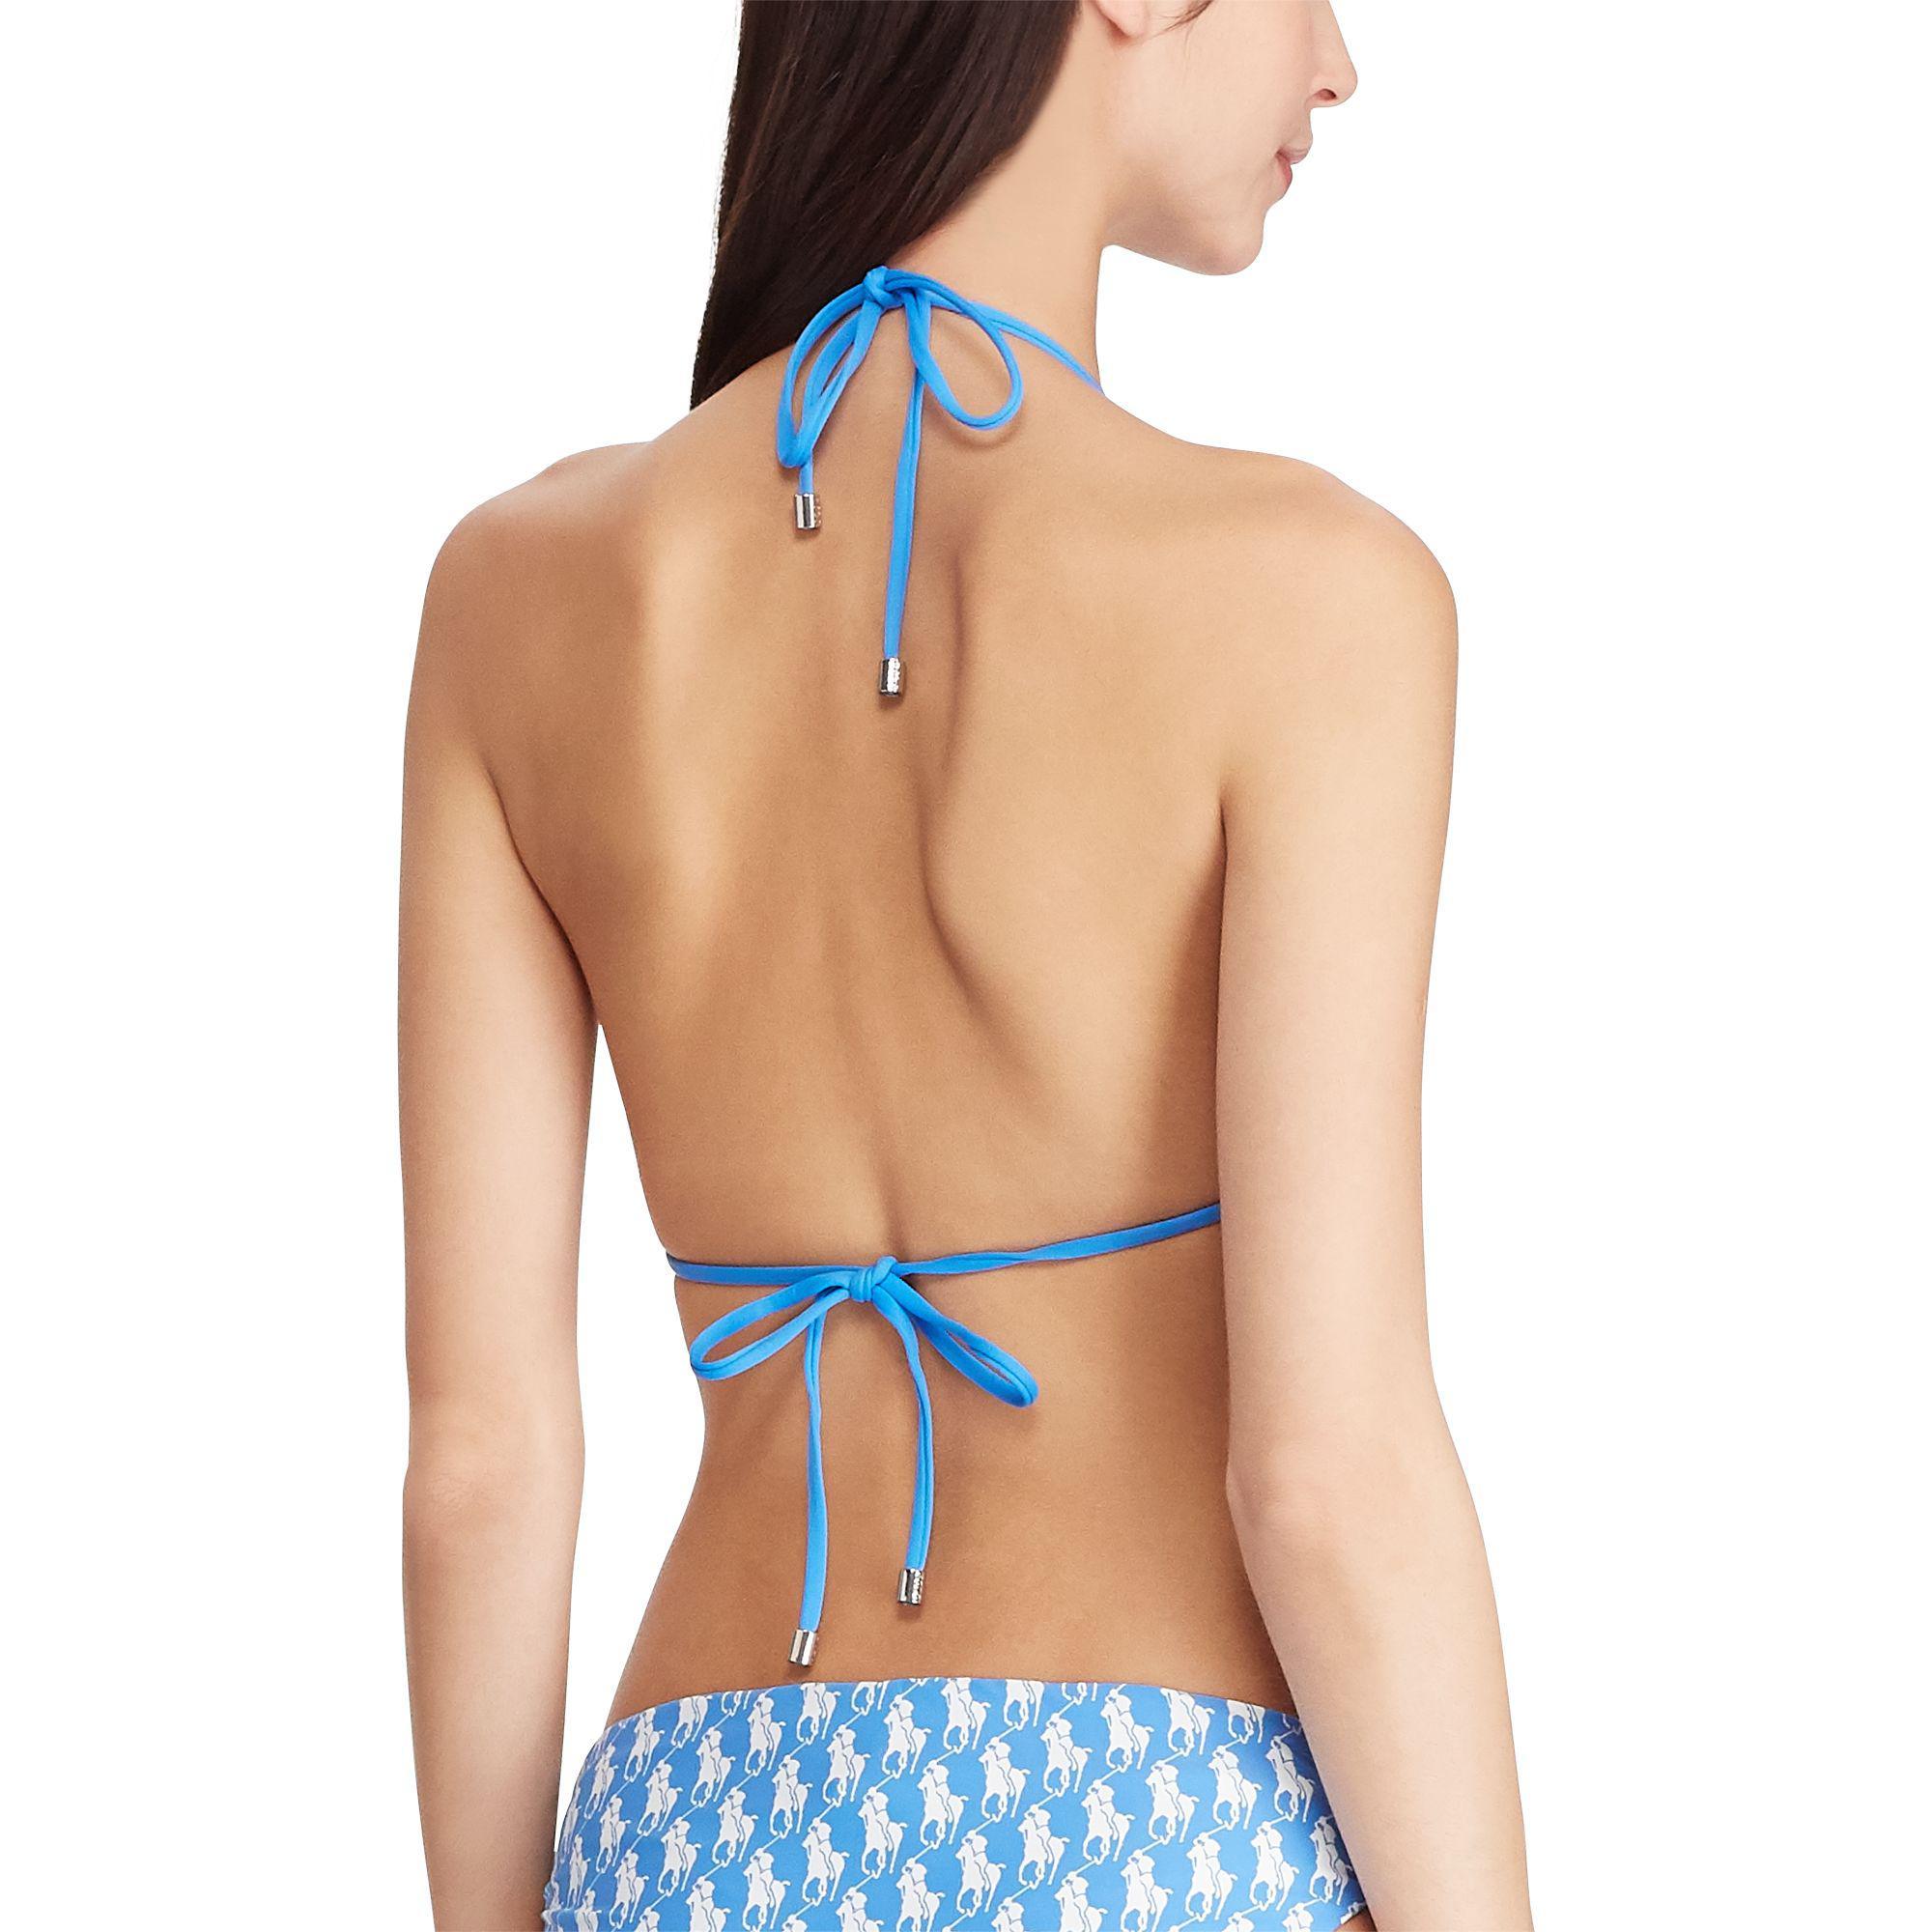 288e8994b2098 Polo Ralph Lauren - Blue Reversible Triangle Bikini Top - Lyst. View  fullscreen